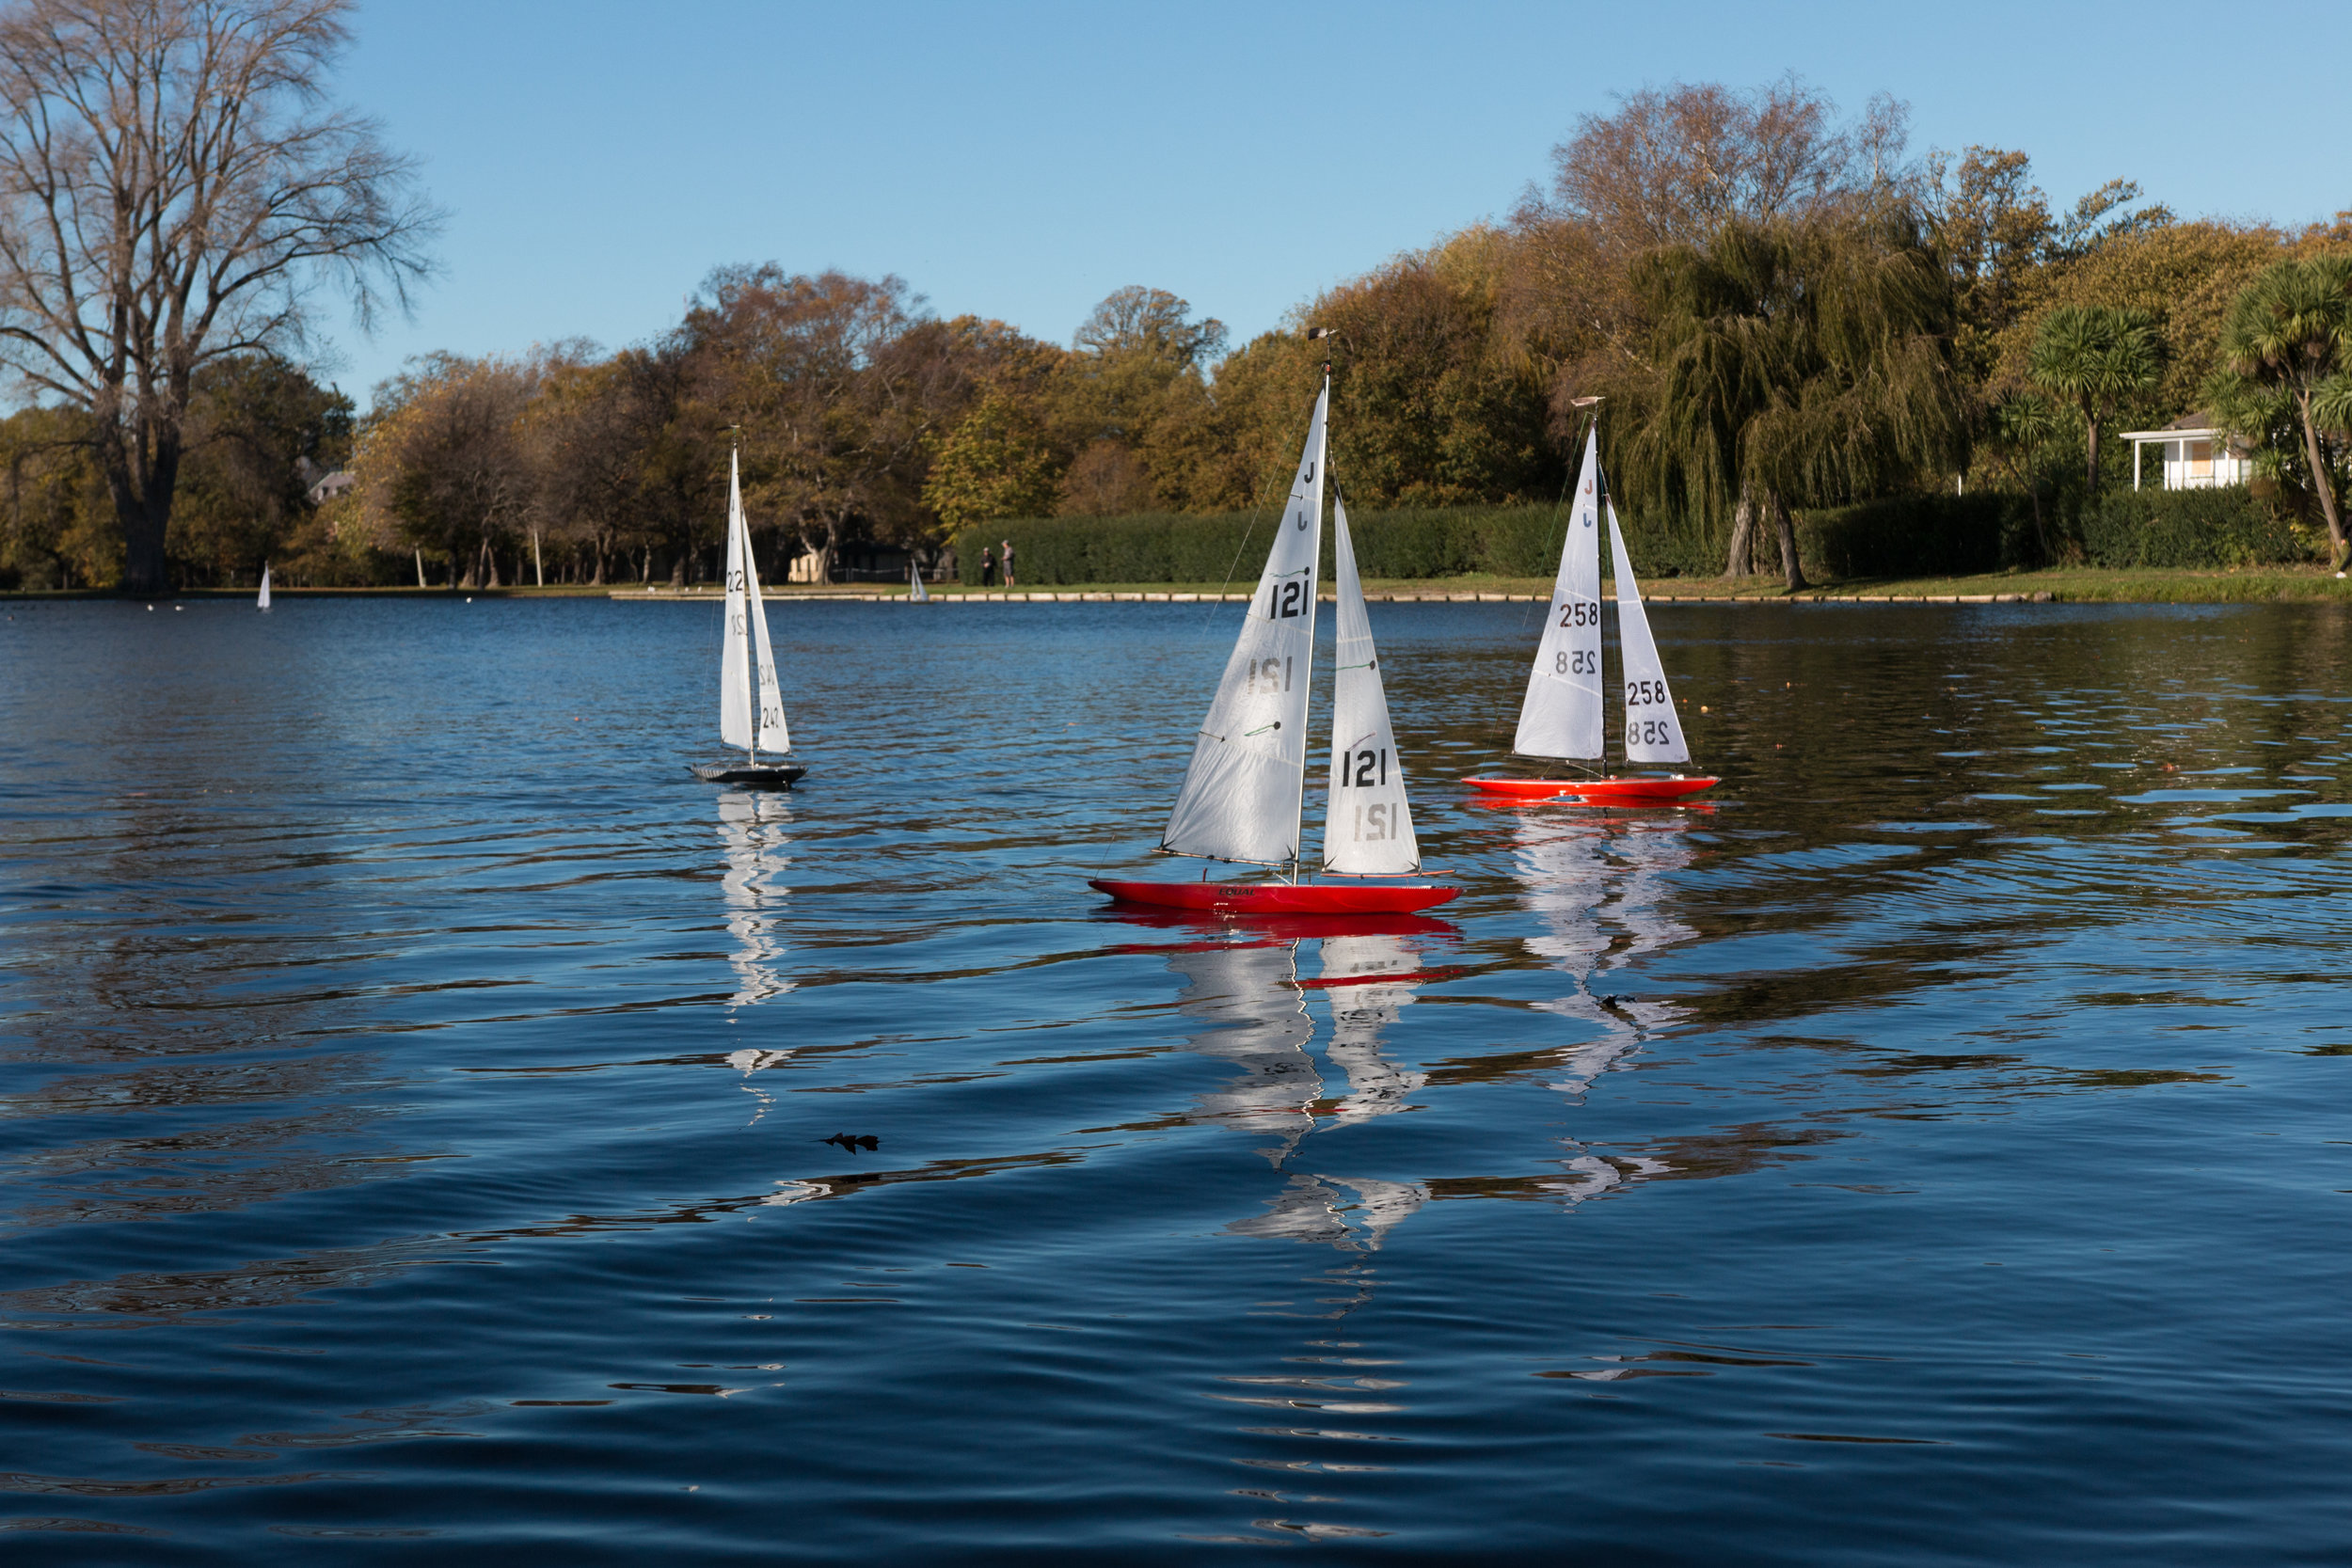 The Sailboat.jpg